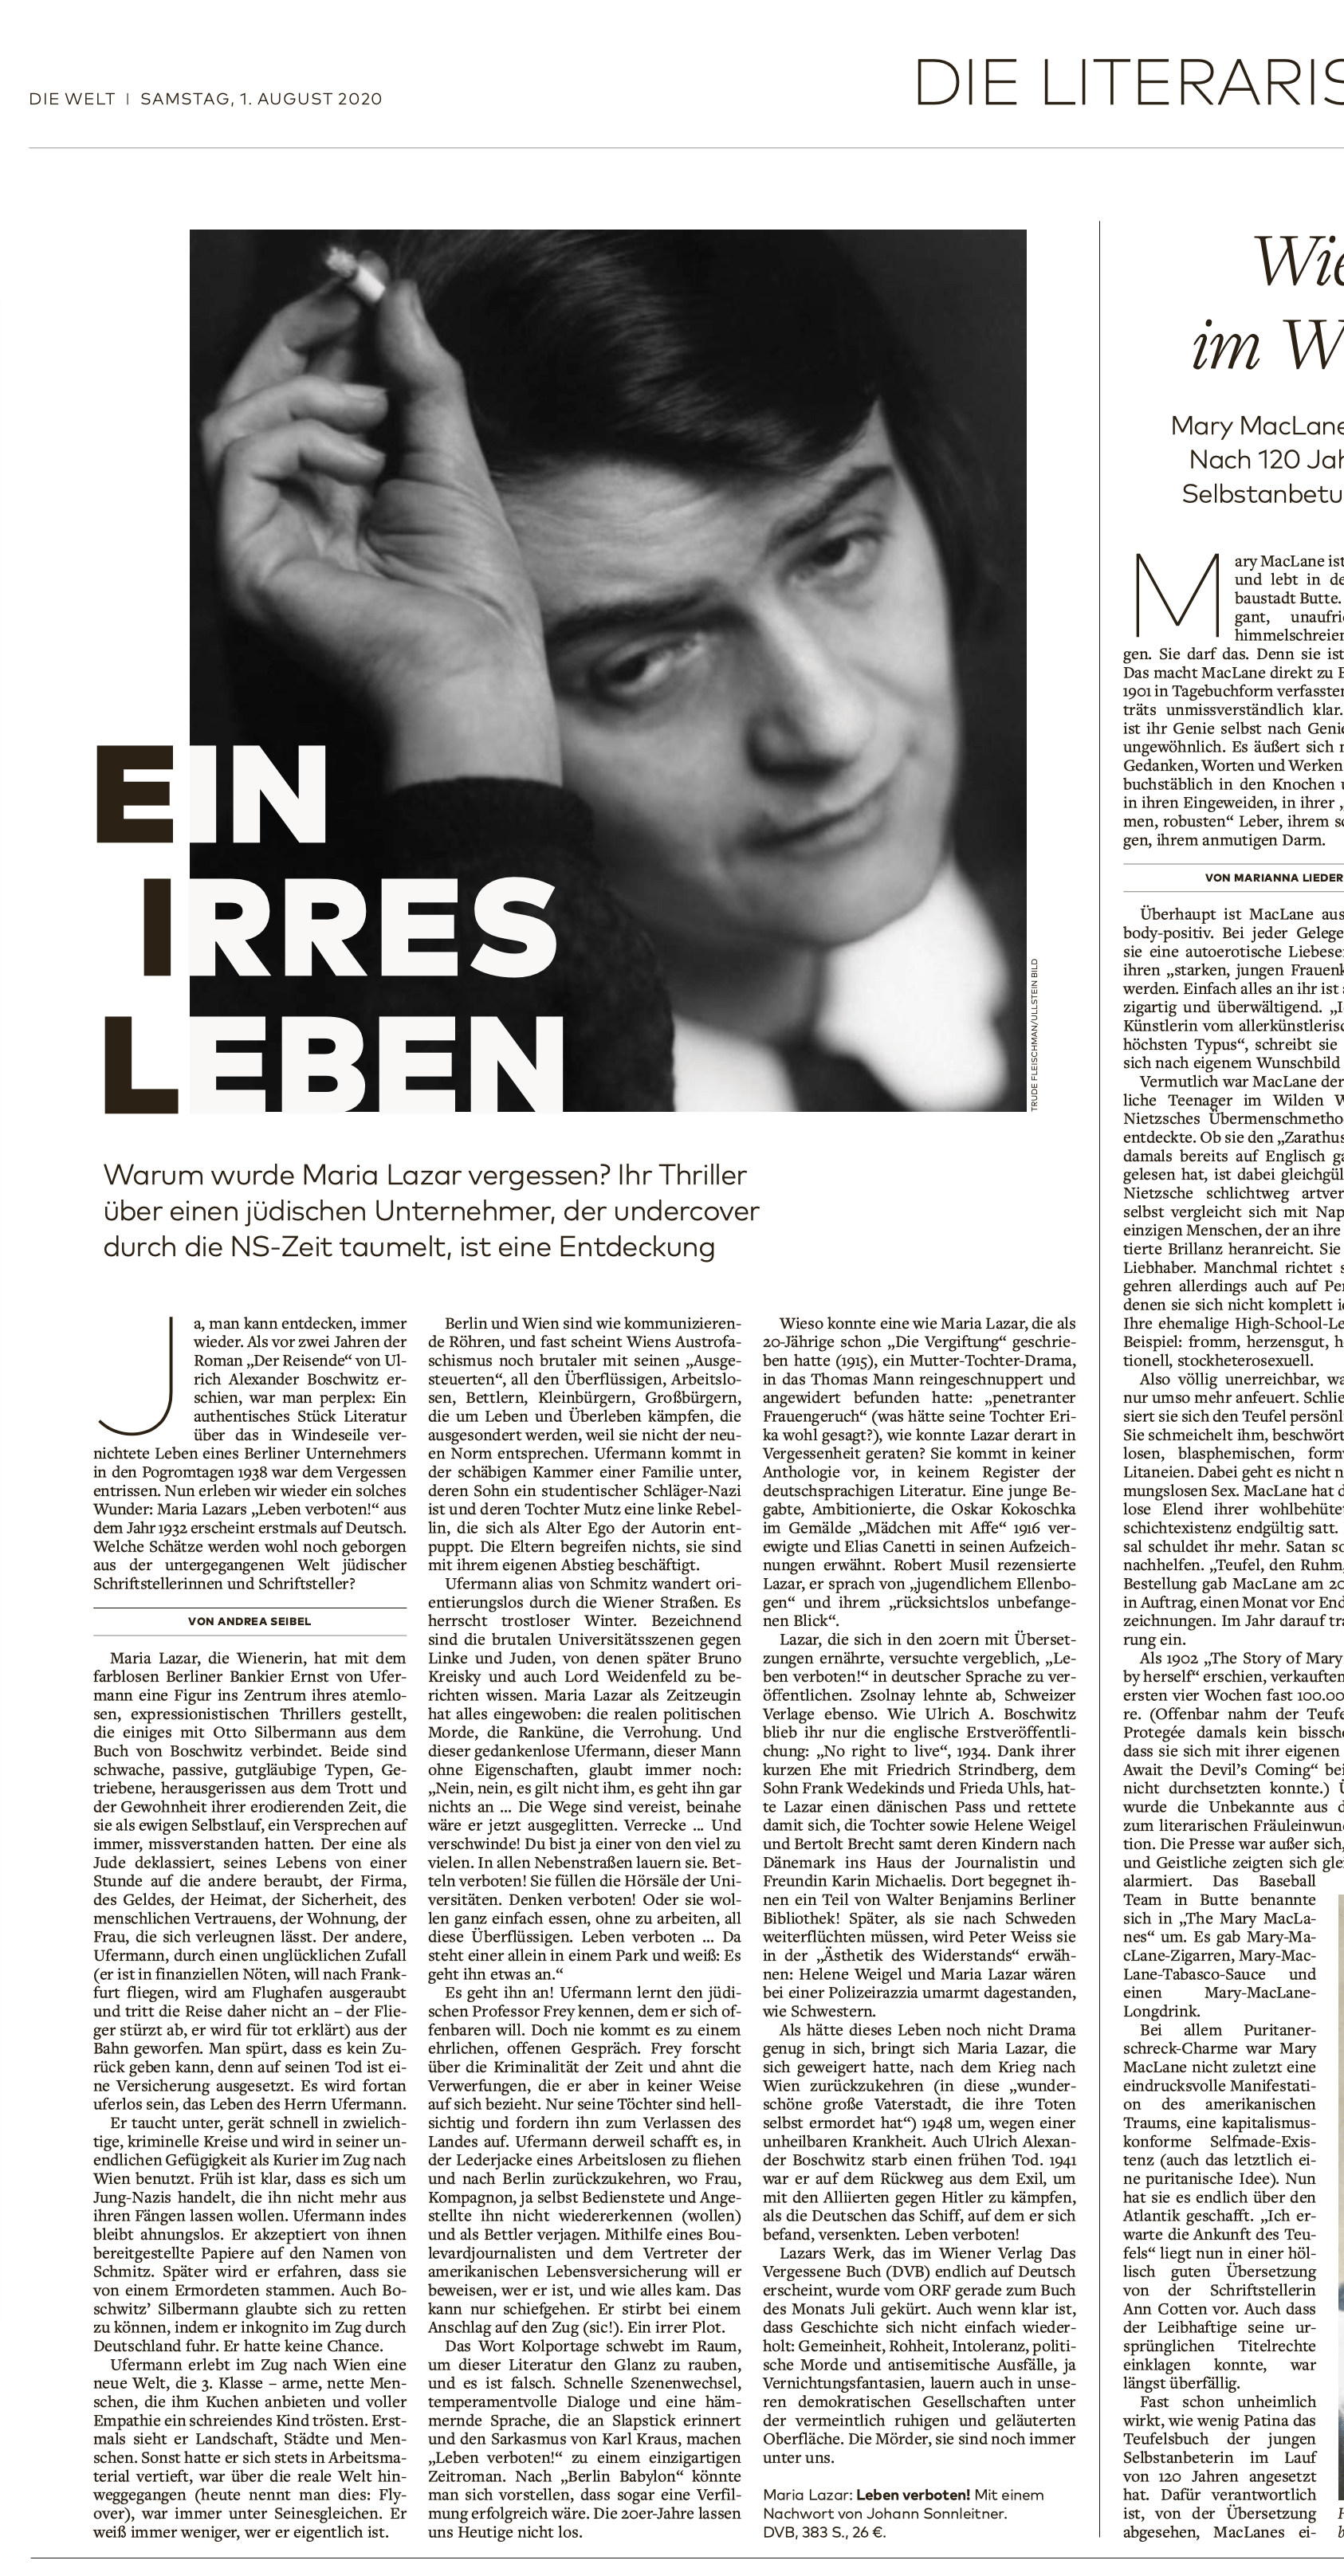 Ausschnitt Literarische WELT – Leben verboten!